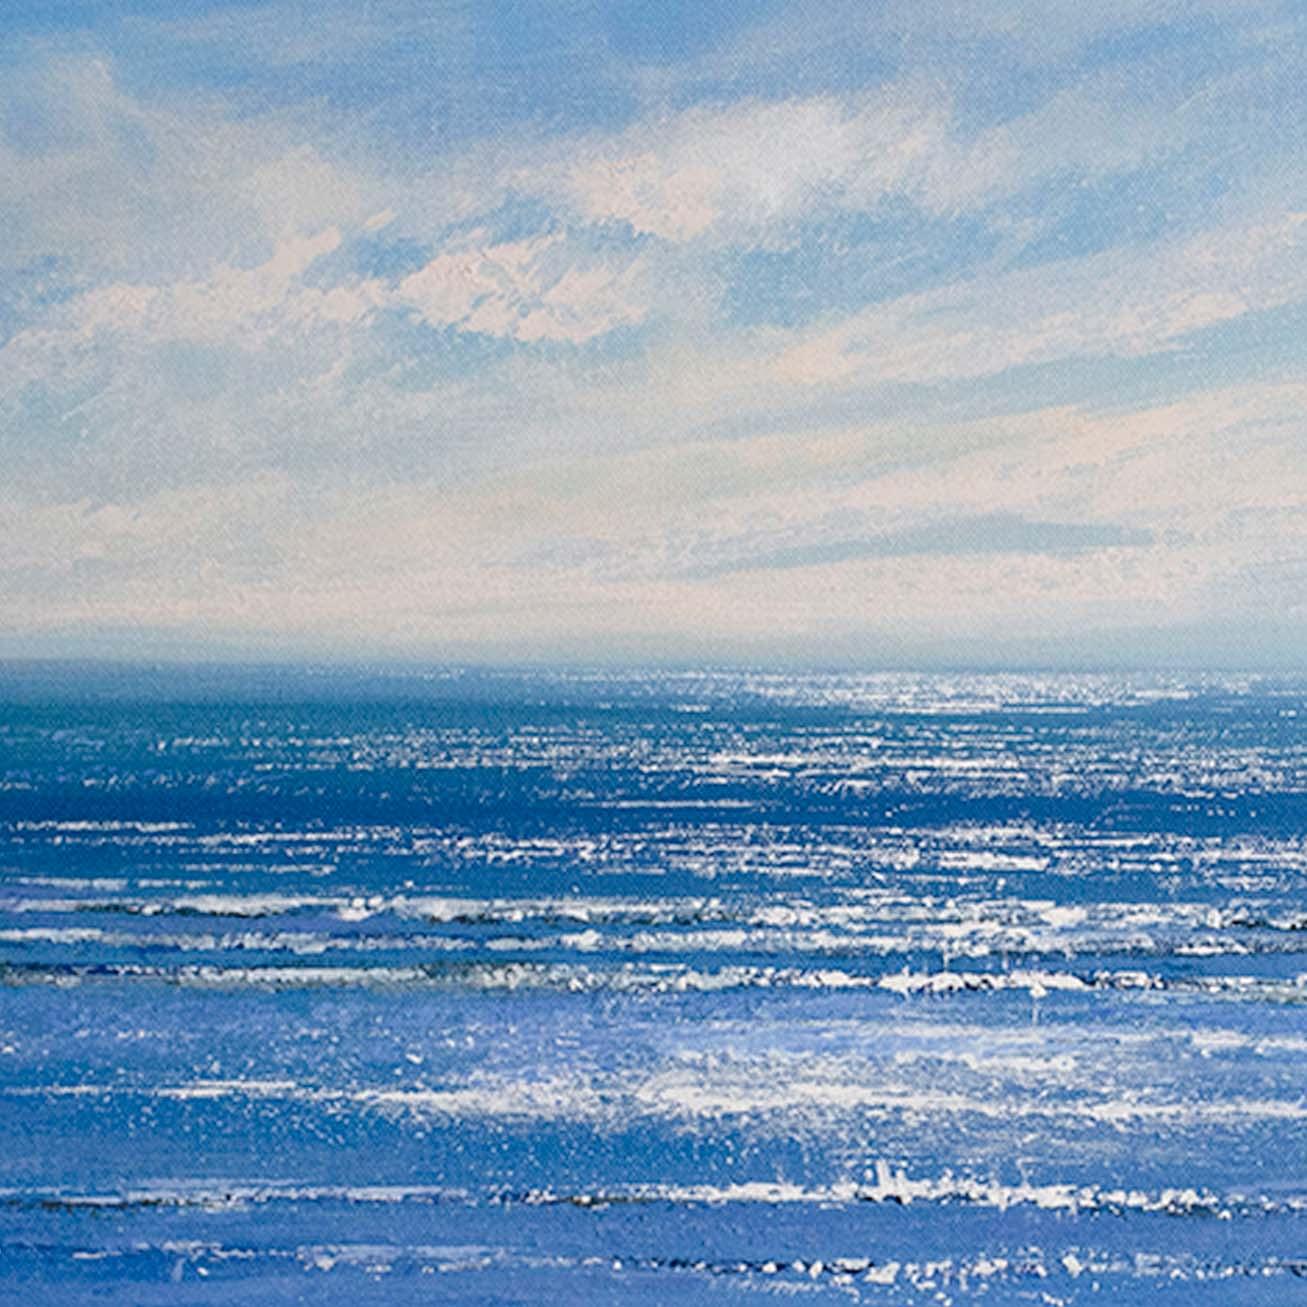 Shining Tide, Wittering